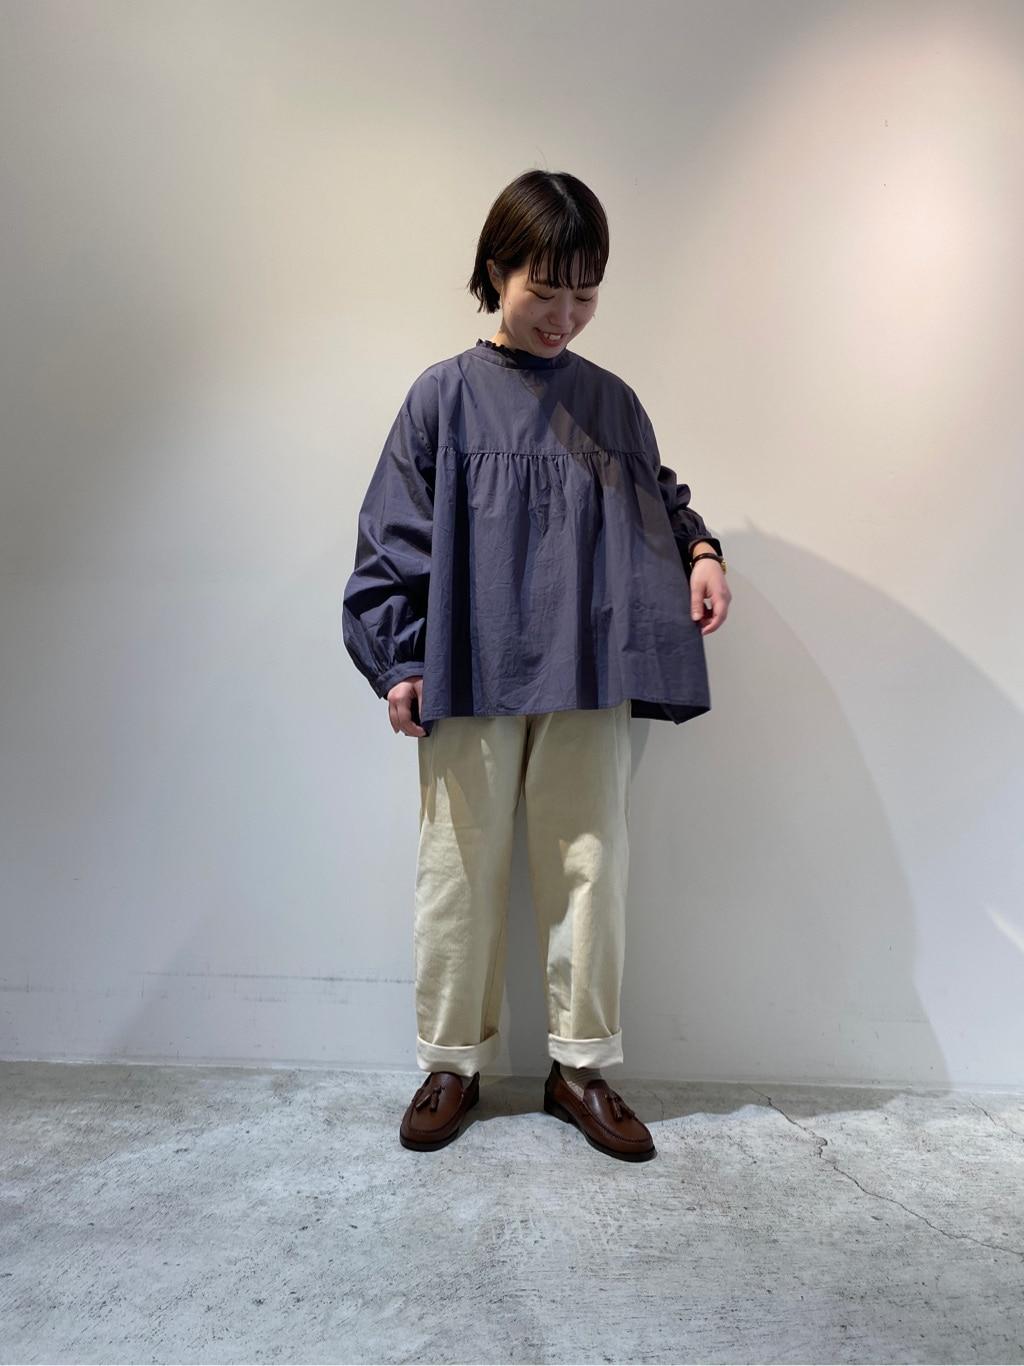 chambre de charme 京都路面 身長:150cm 2020.09.09